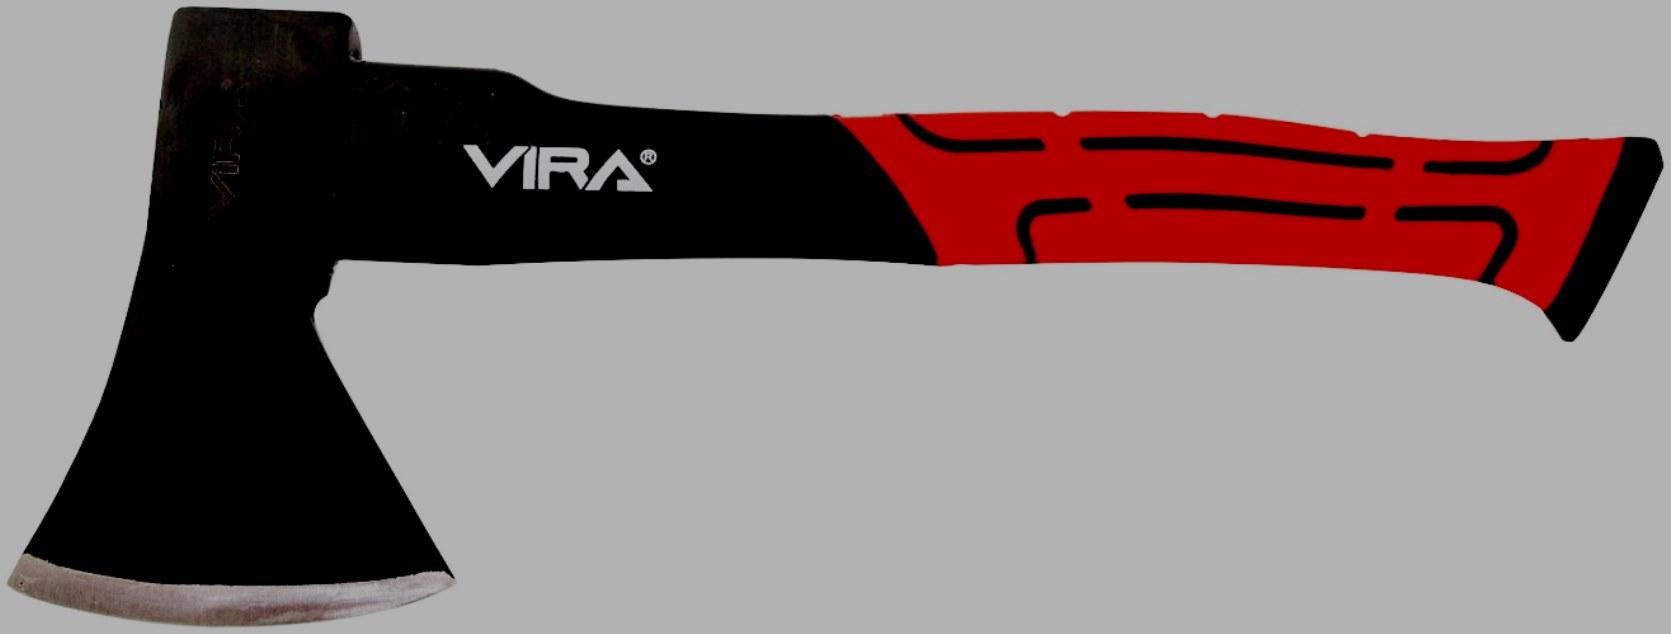 Vira 900113 (1000 г)